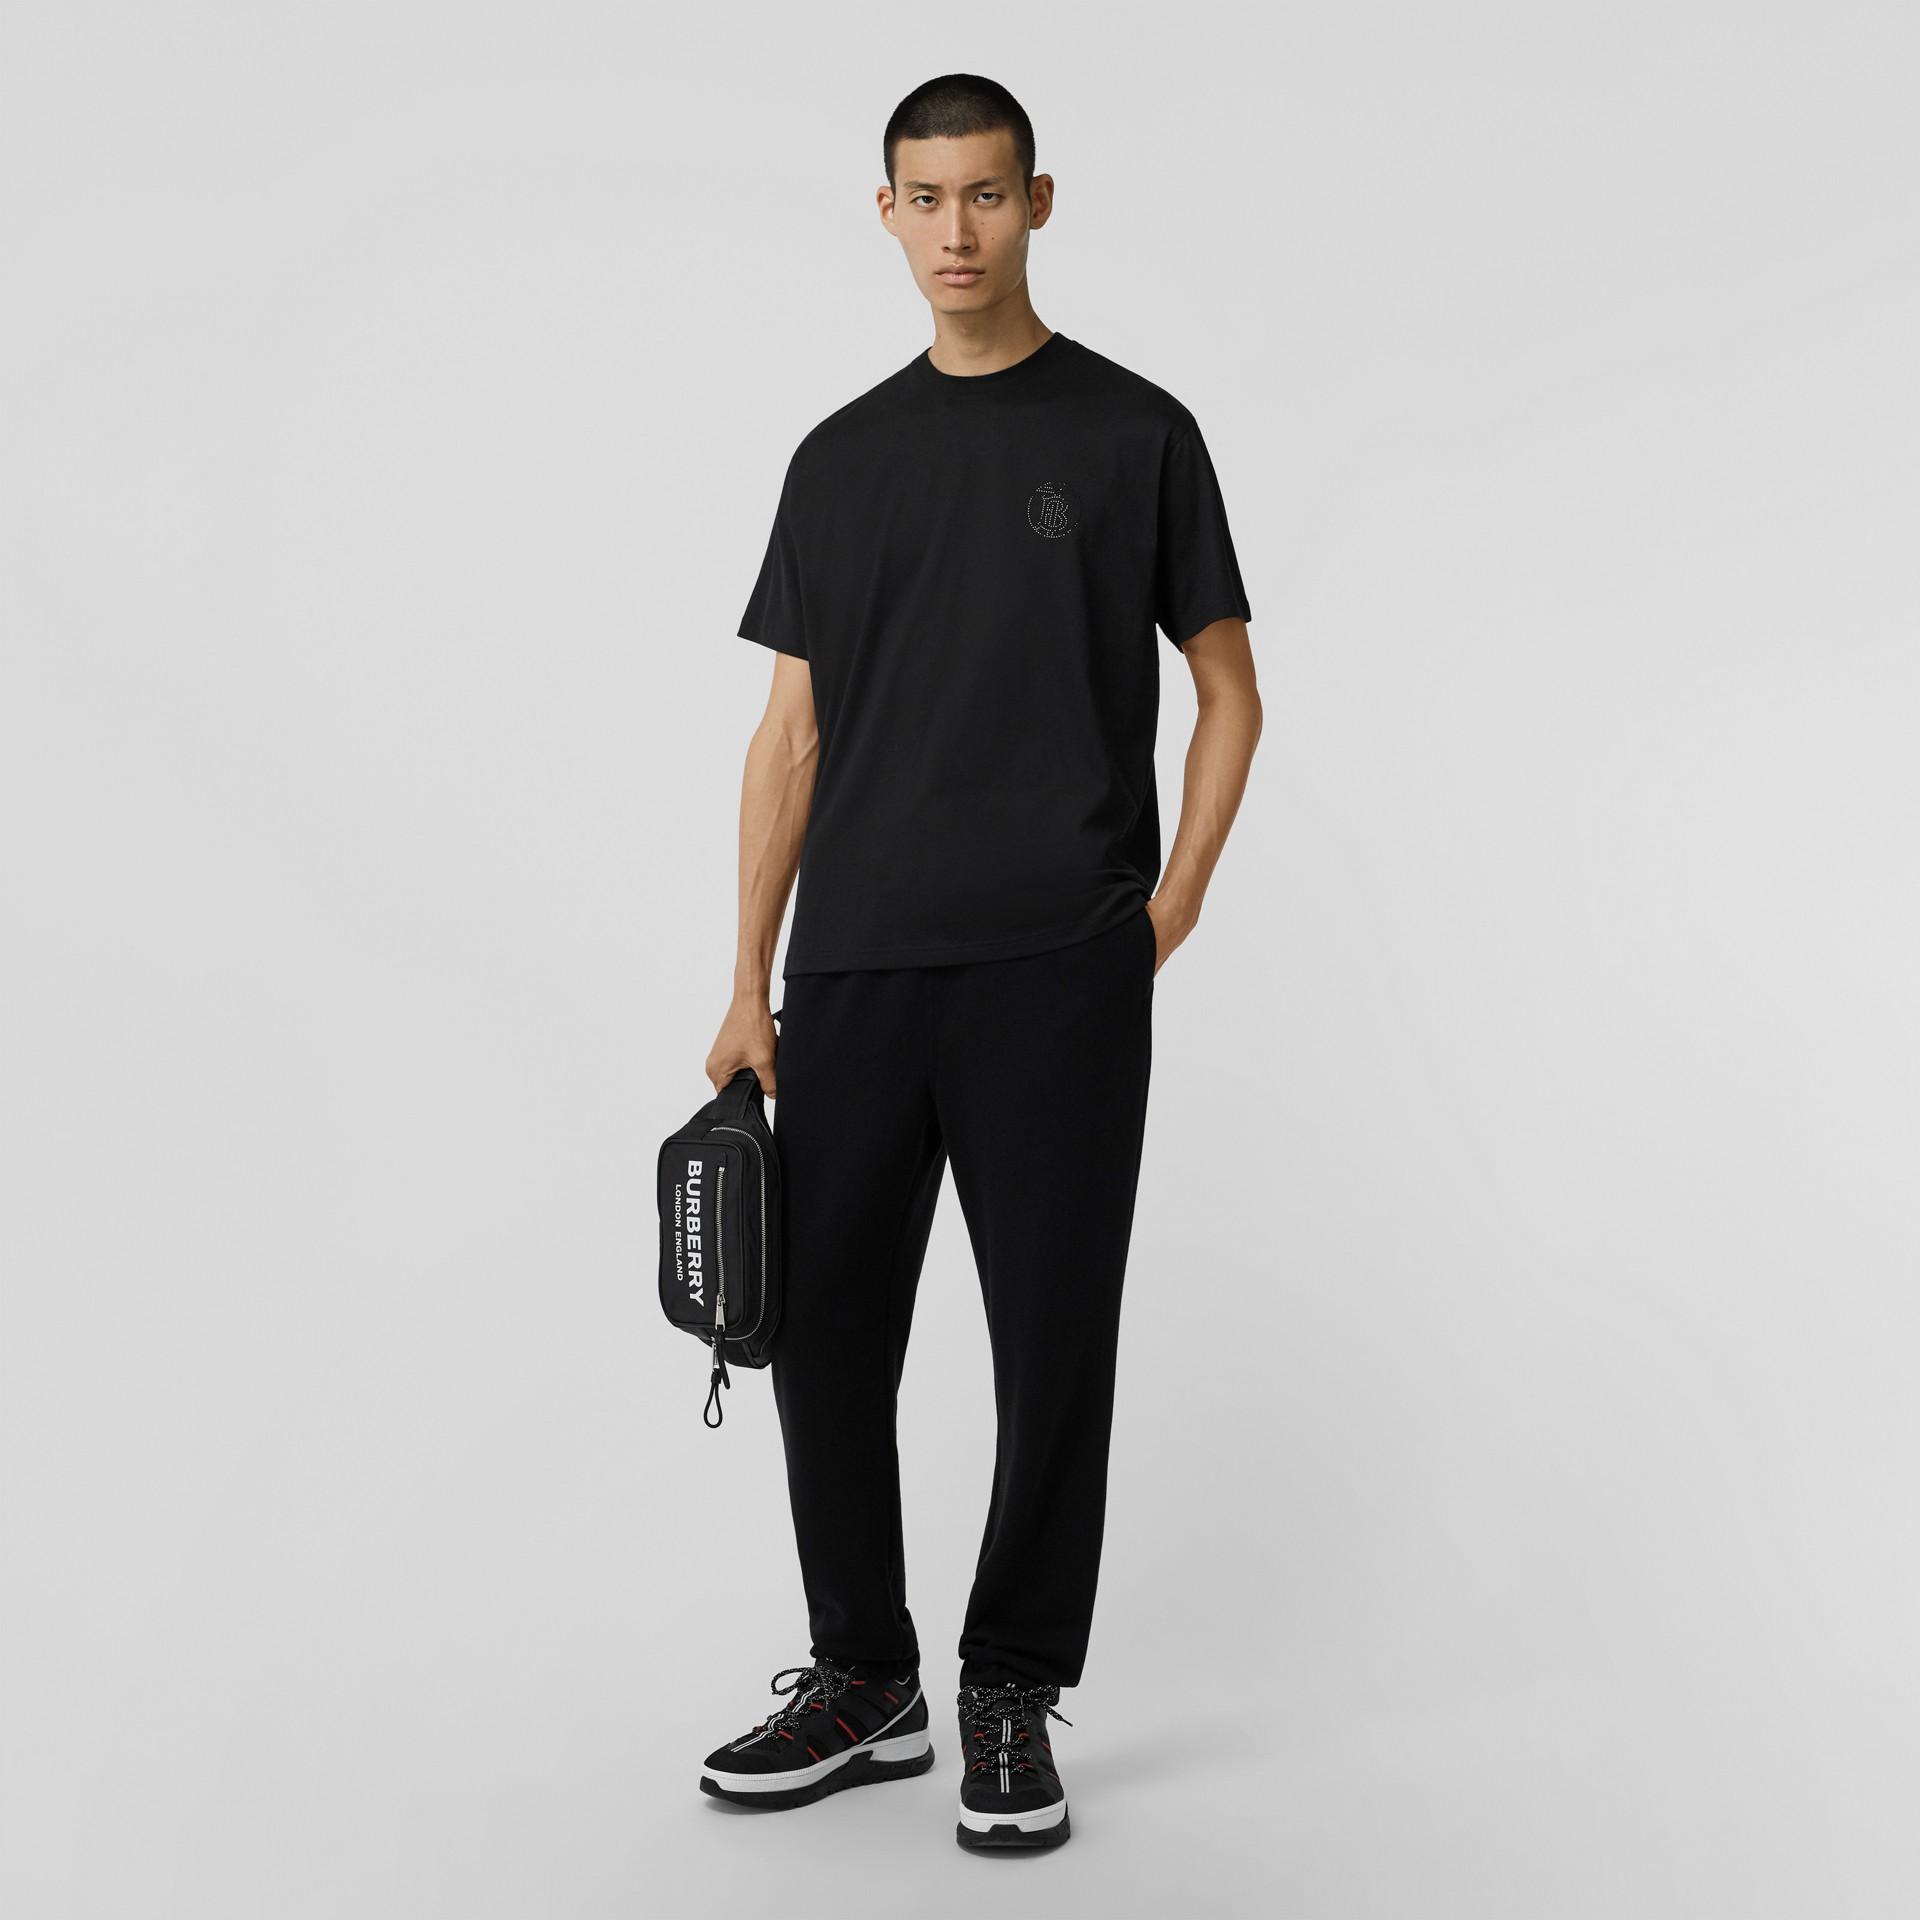 Crystal Monogram Motif Cotton Oversized T-shirt in Black - Men | Burberry - gallery image 3